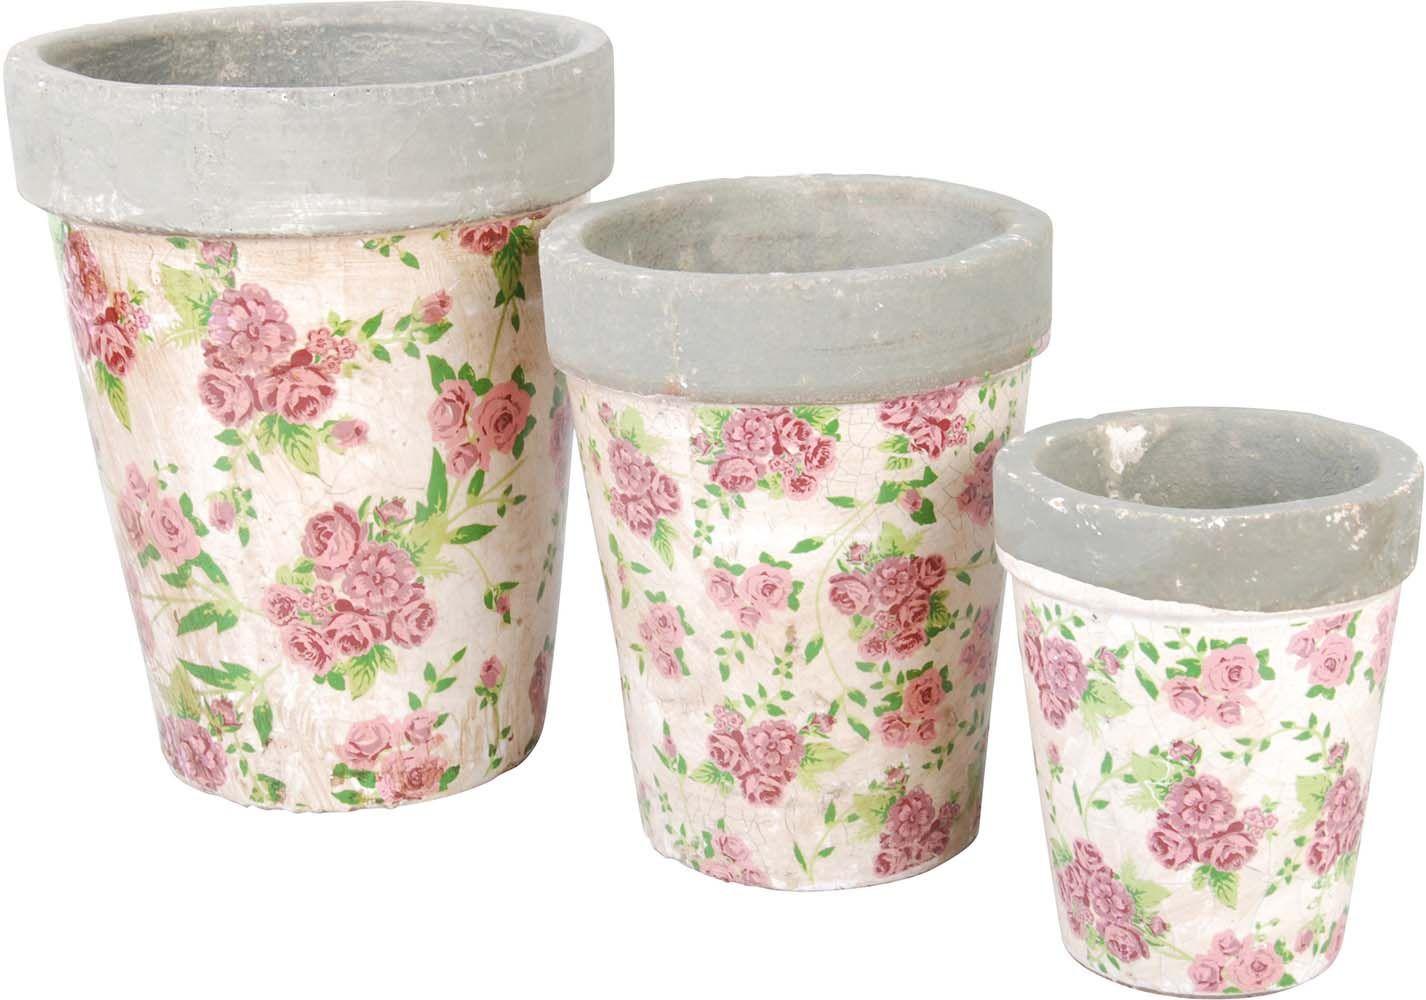 pots de fleurs ronds les roses lot de 3. Black Bedroom Furniture Sets. Home Design Ideas